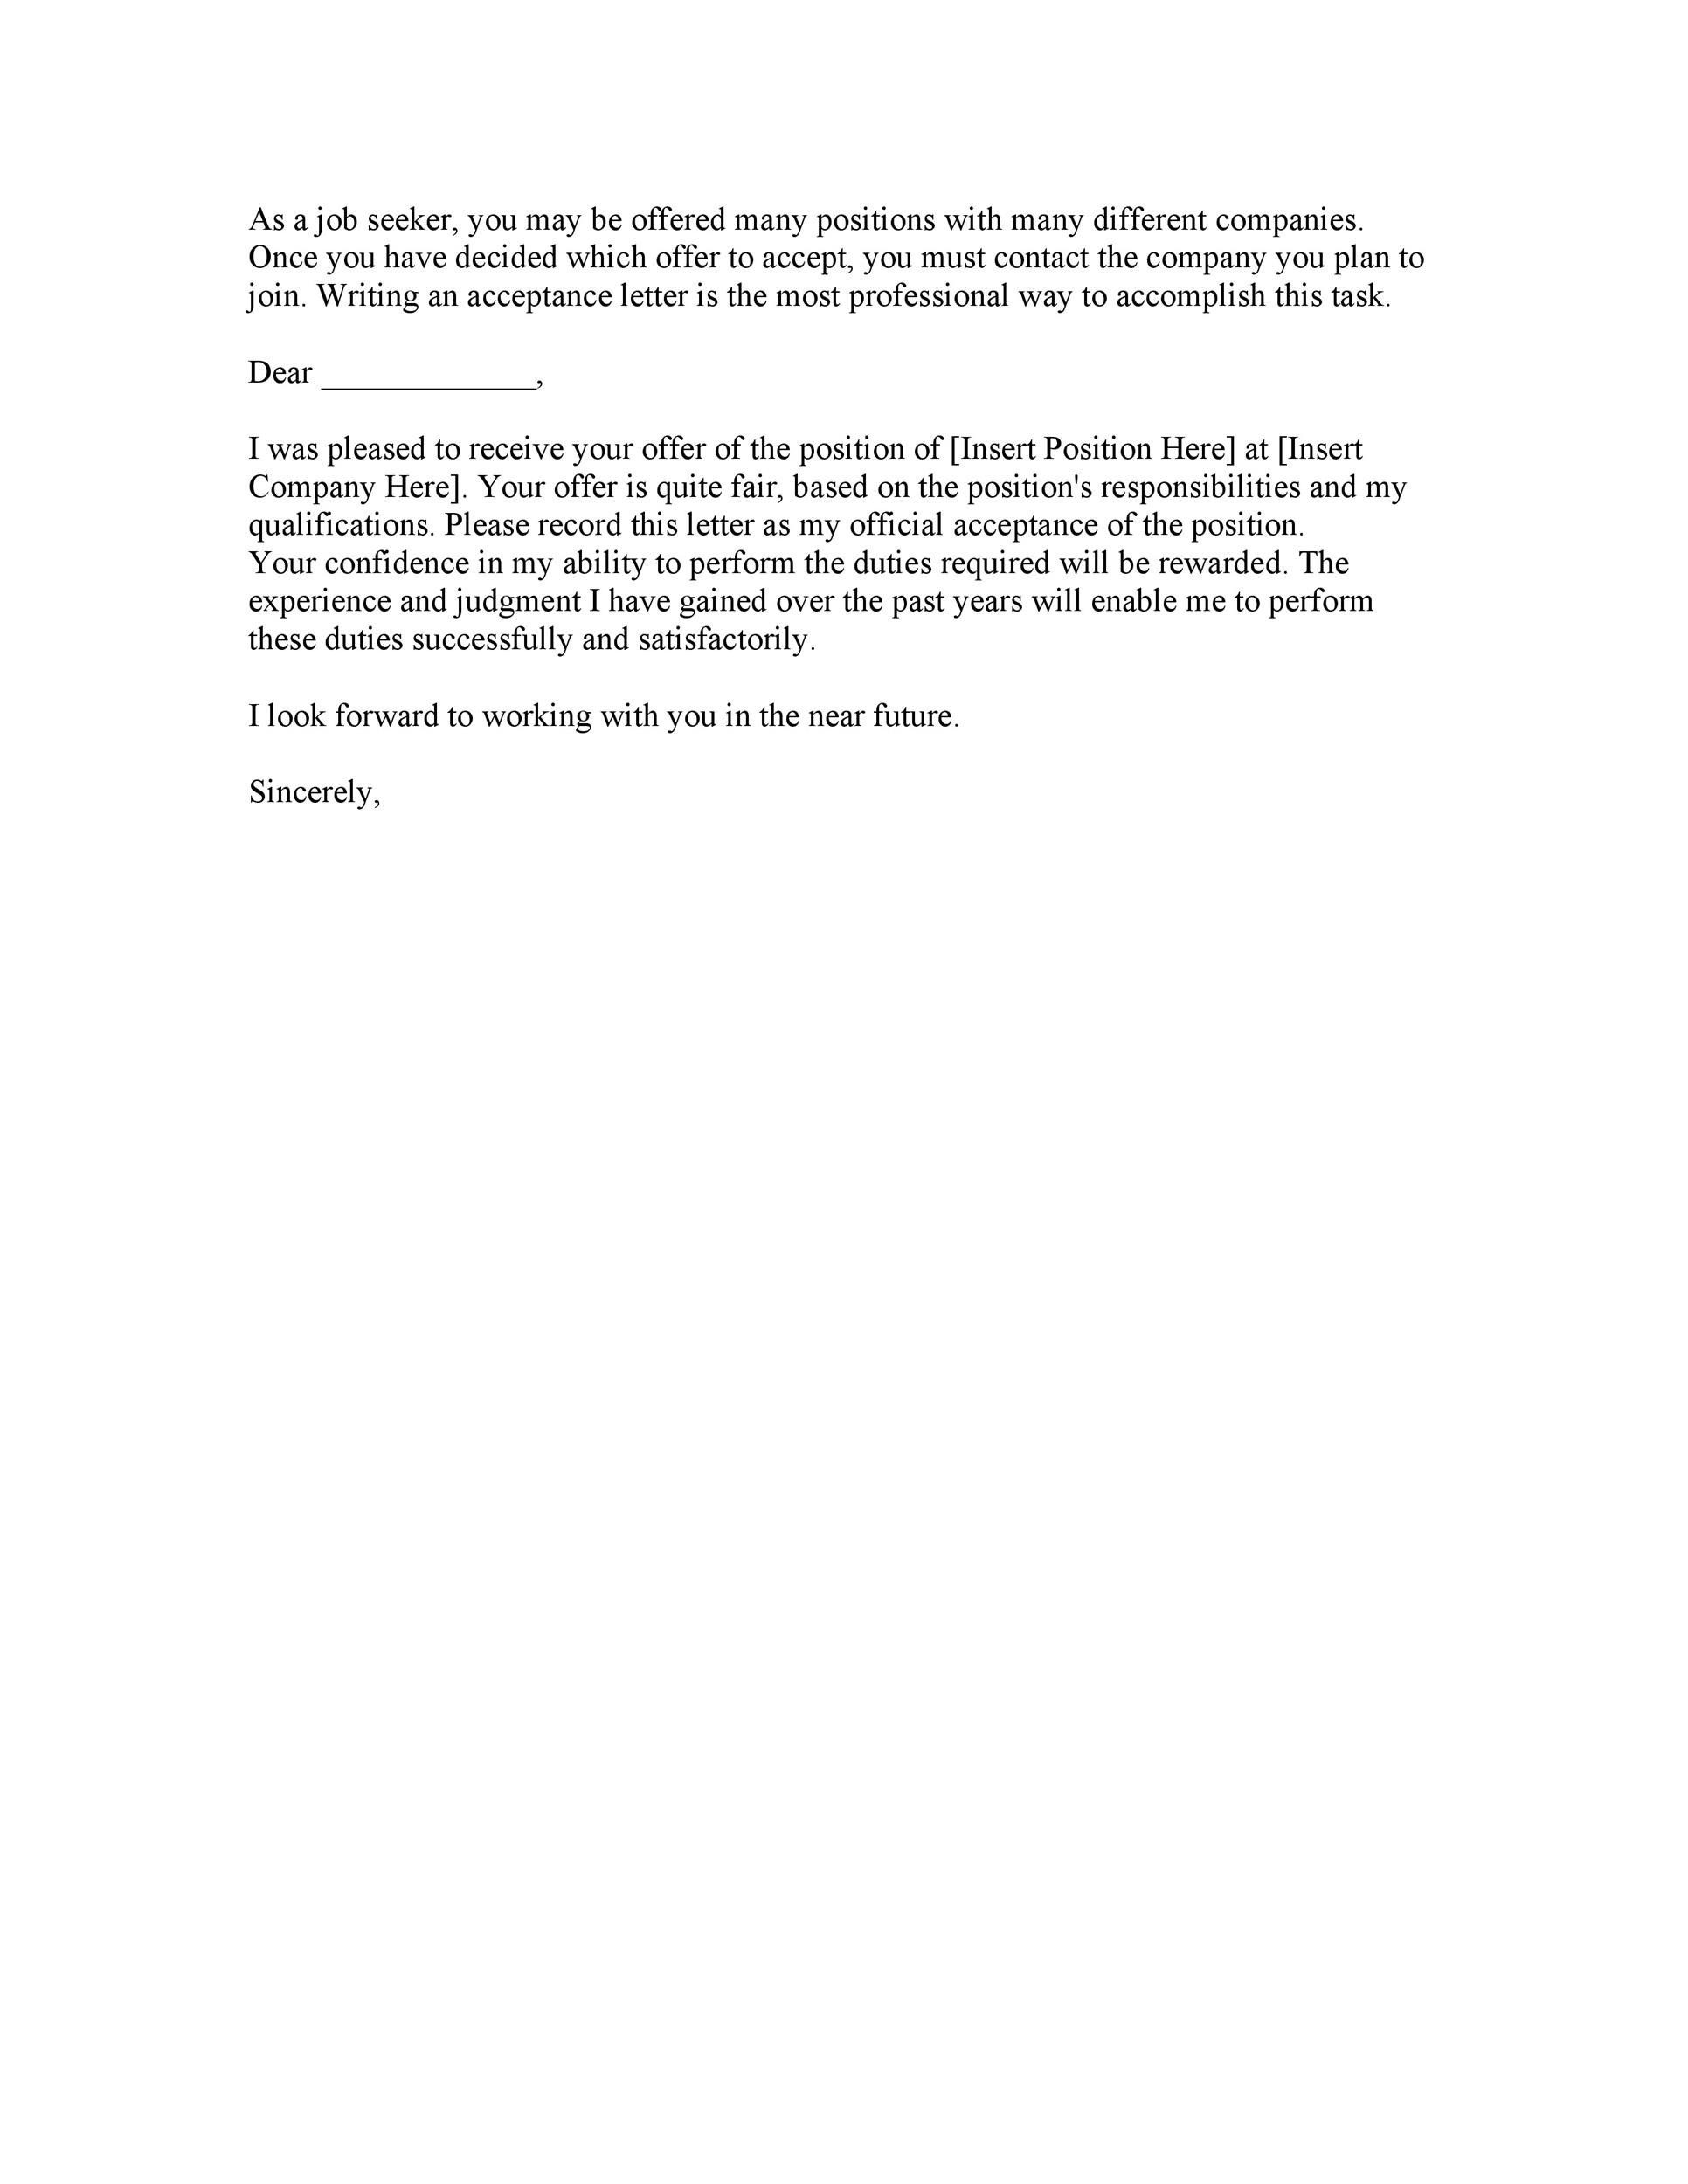 Free job acceptance letter 24